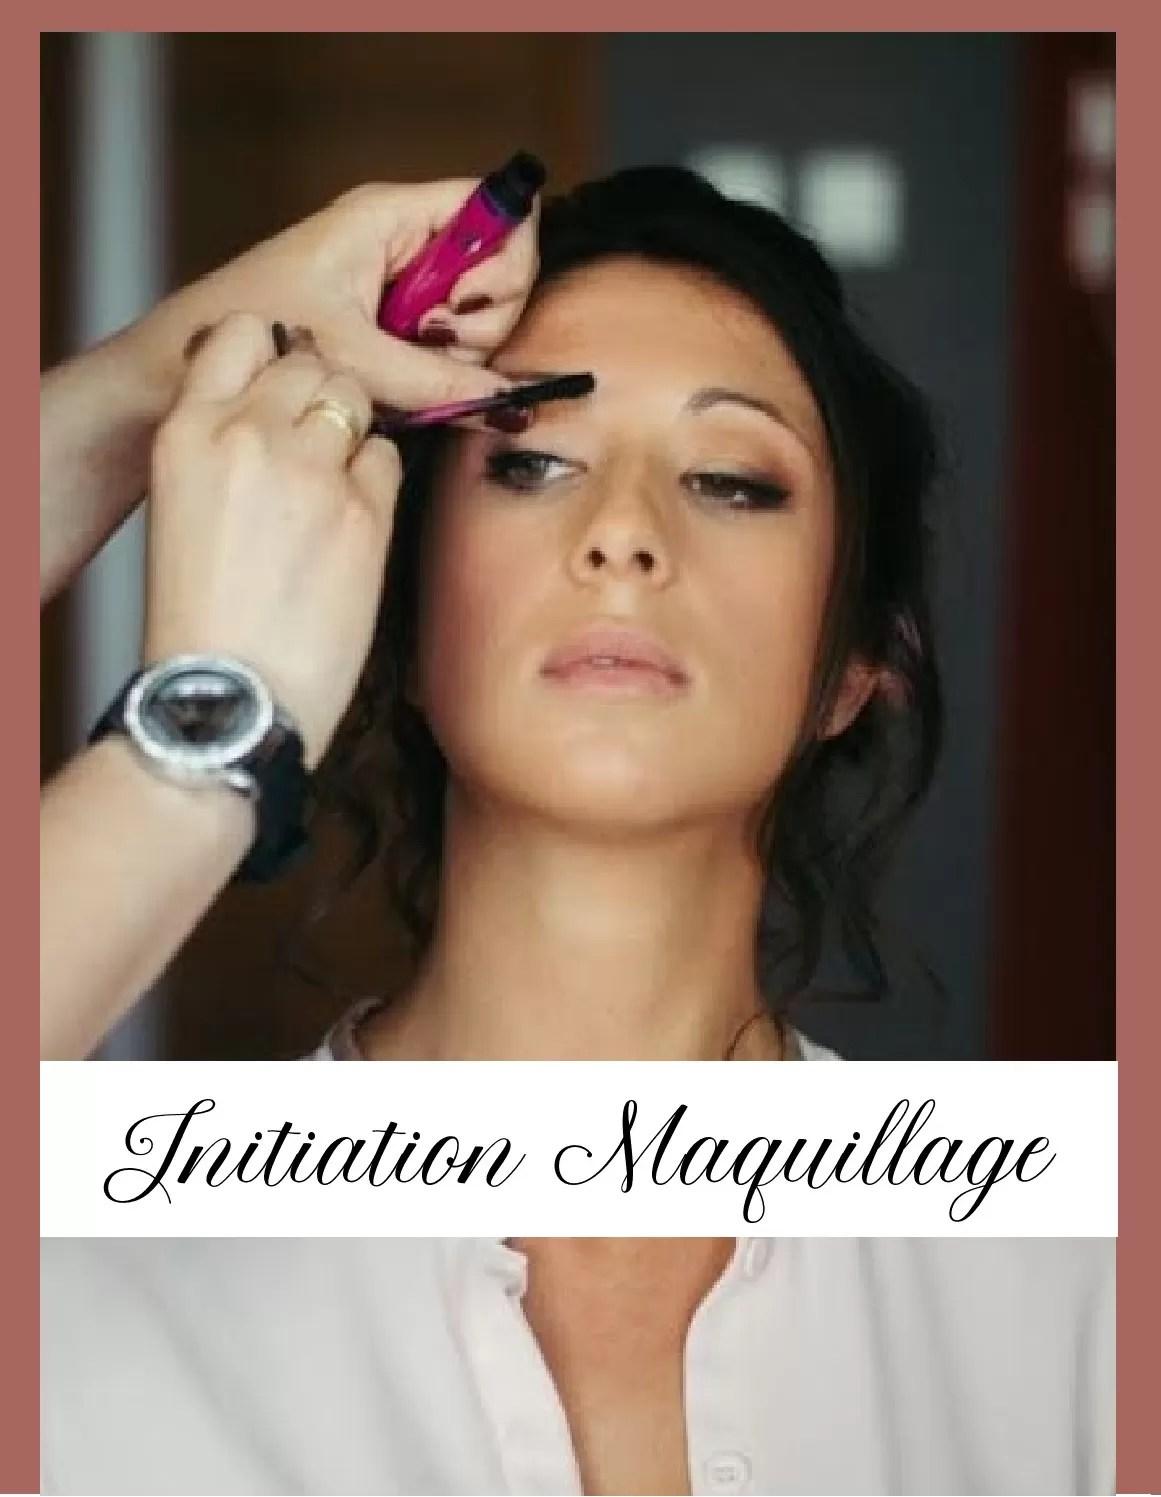 formation initiation maquillage Normandie Cherbourg la Manche